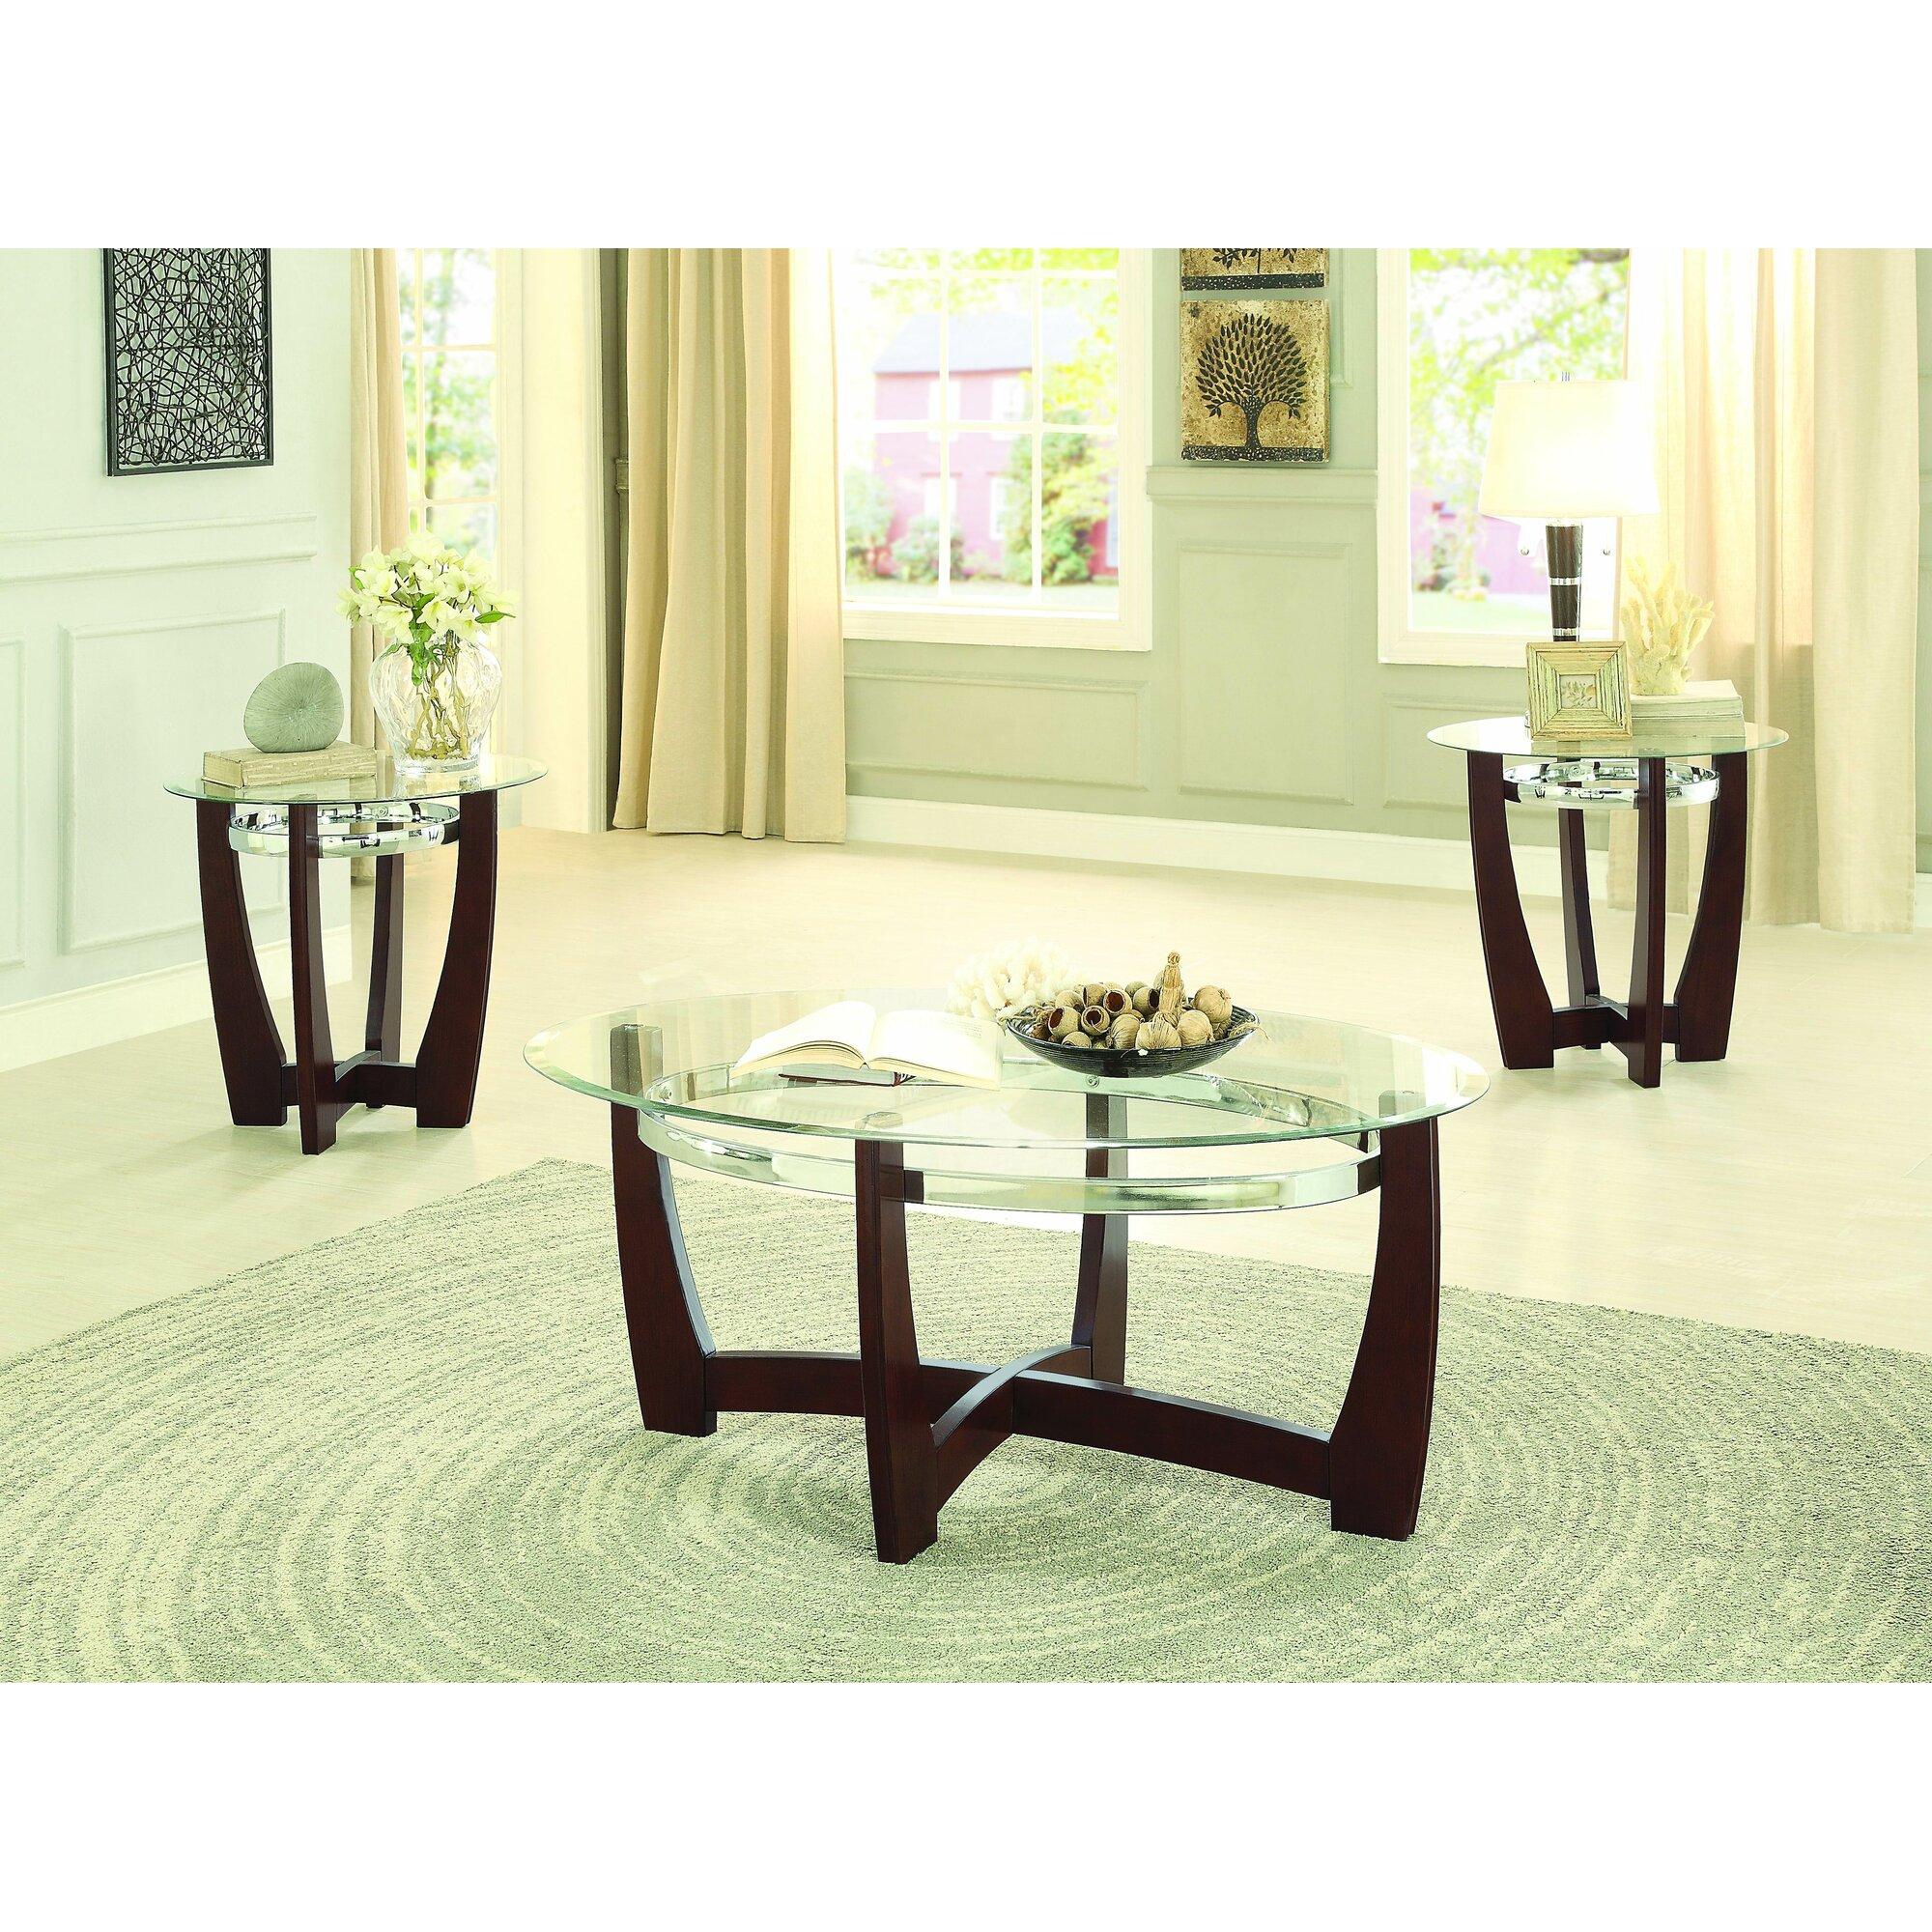 Coffee Table Sets At Wayfair: Latitude Run Catalina 3 Piece Coffee Table Set & Reviews